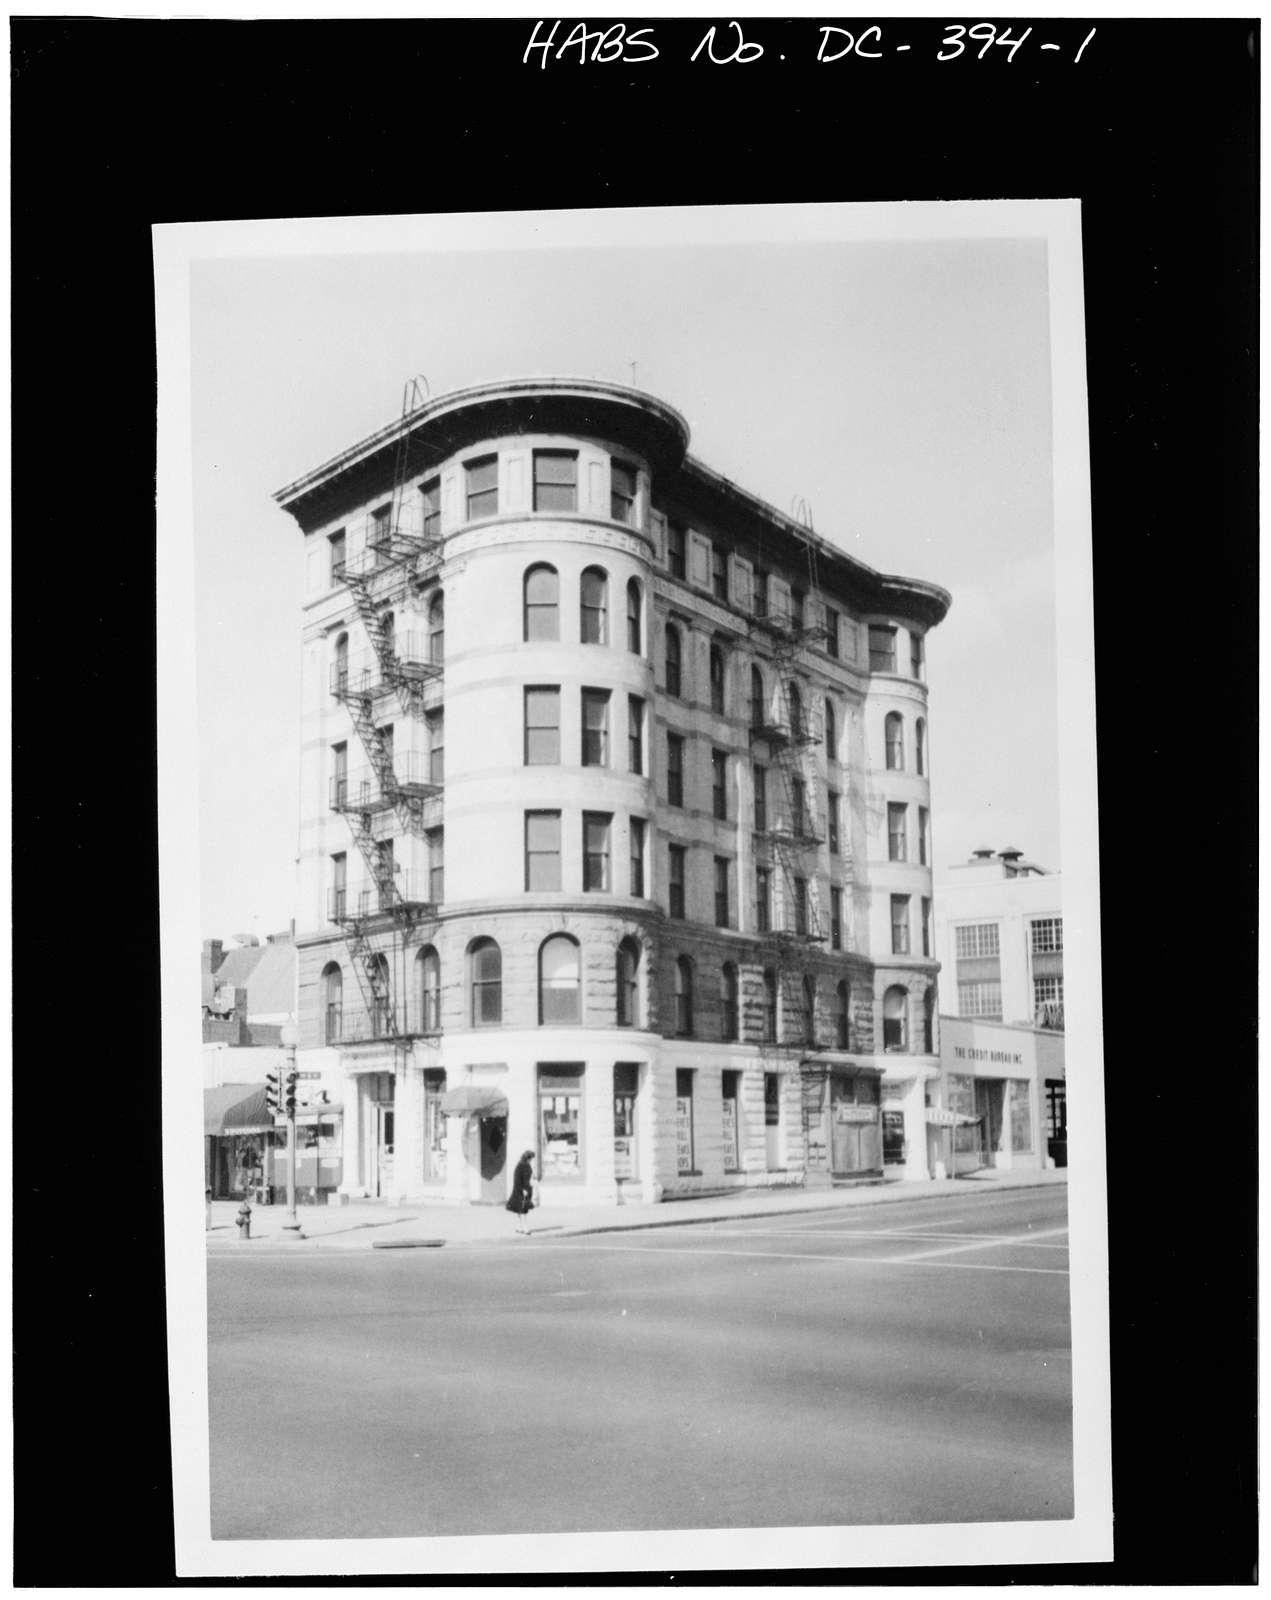 Atlantic Coastline Building, 601 Pennsylvania Avenue Northwest, Washington, District of Columbia, DC